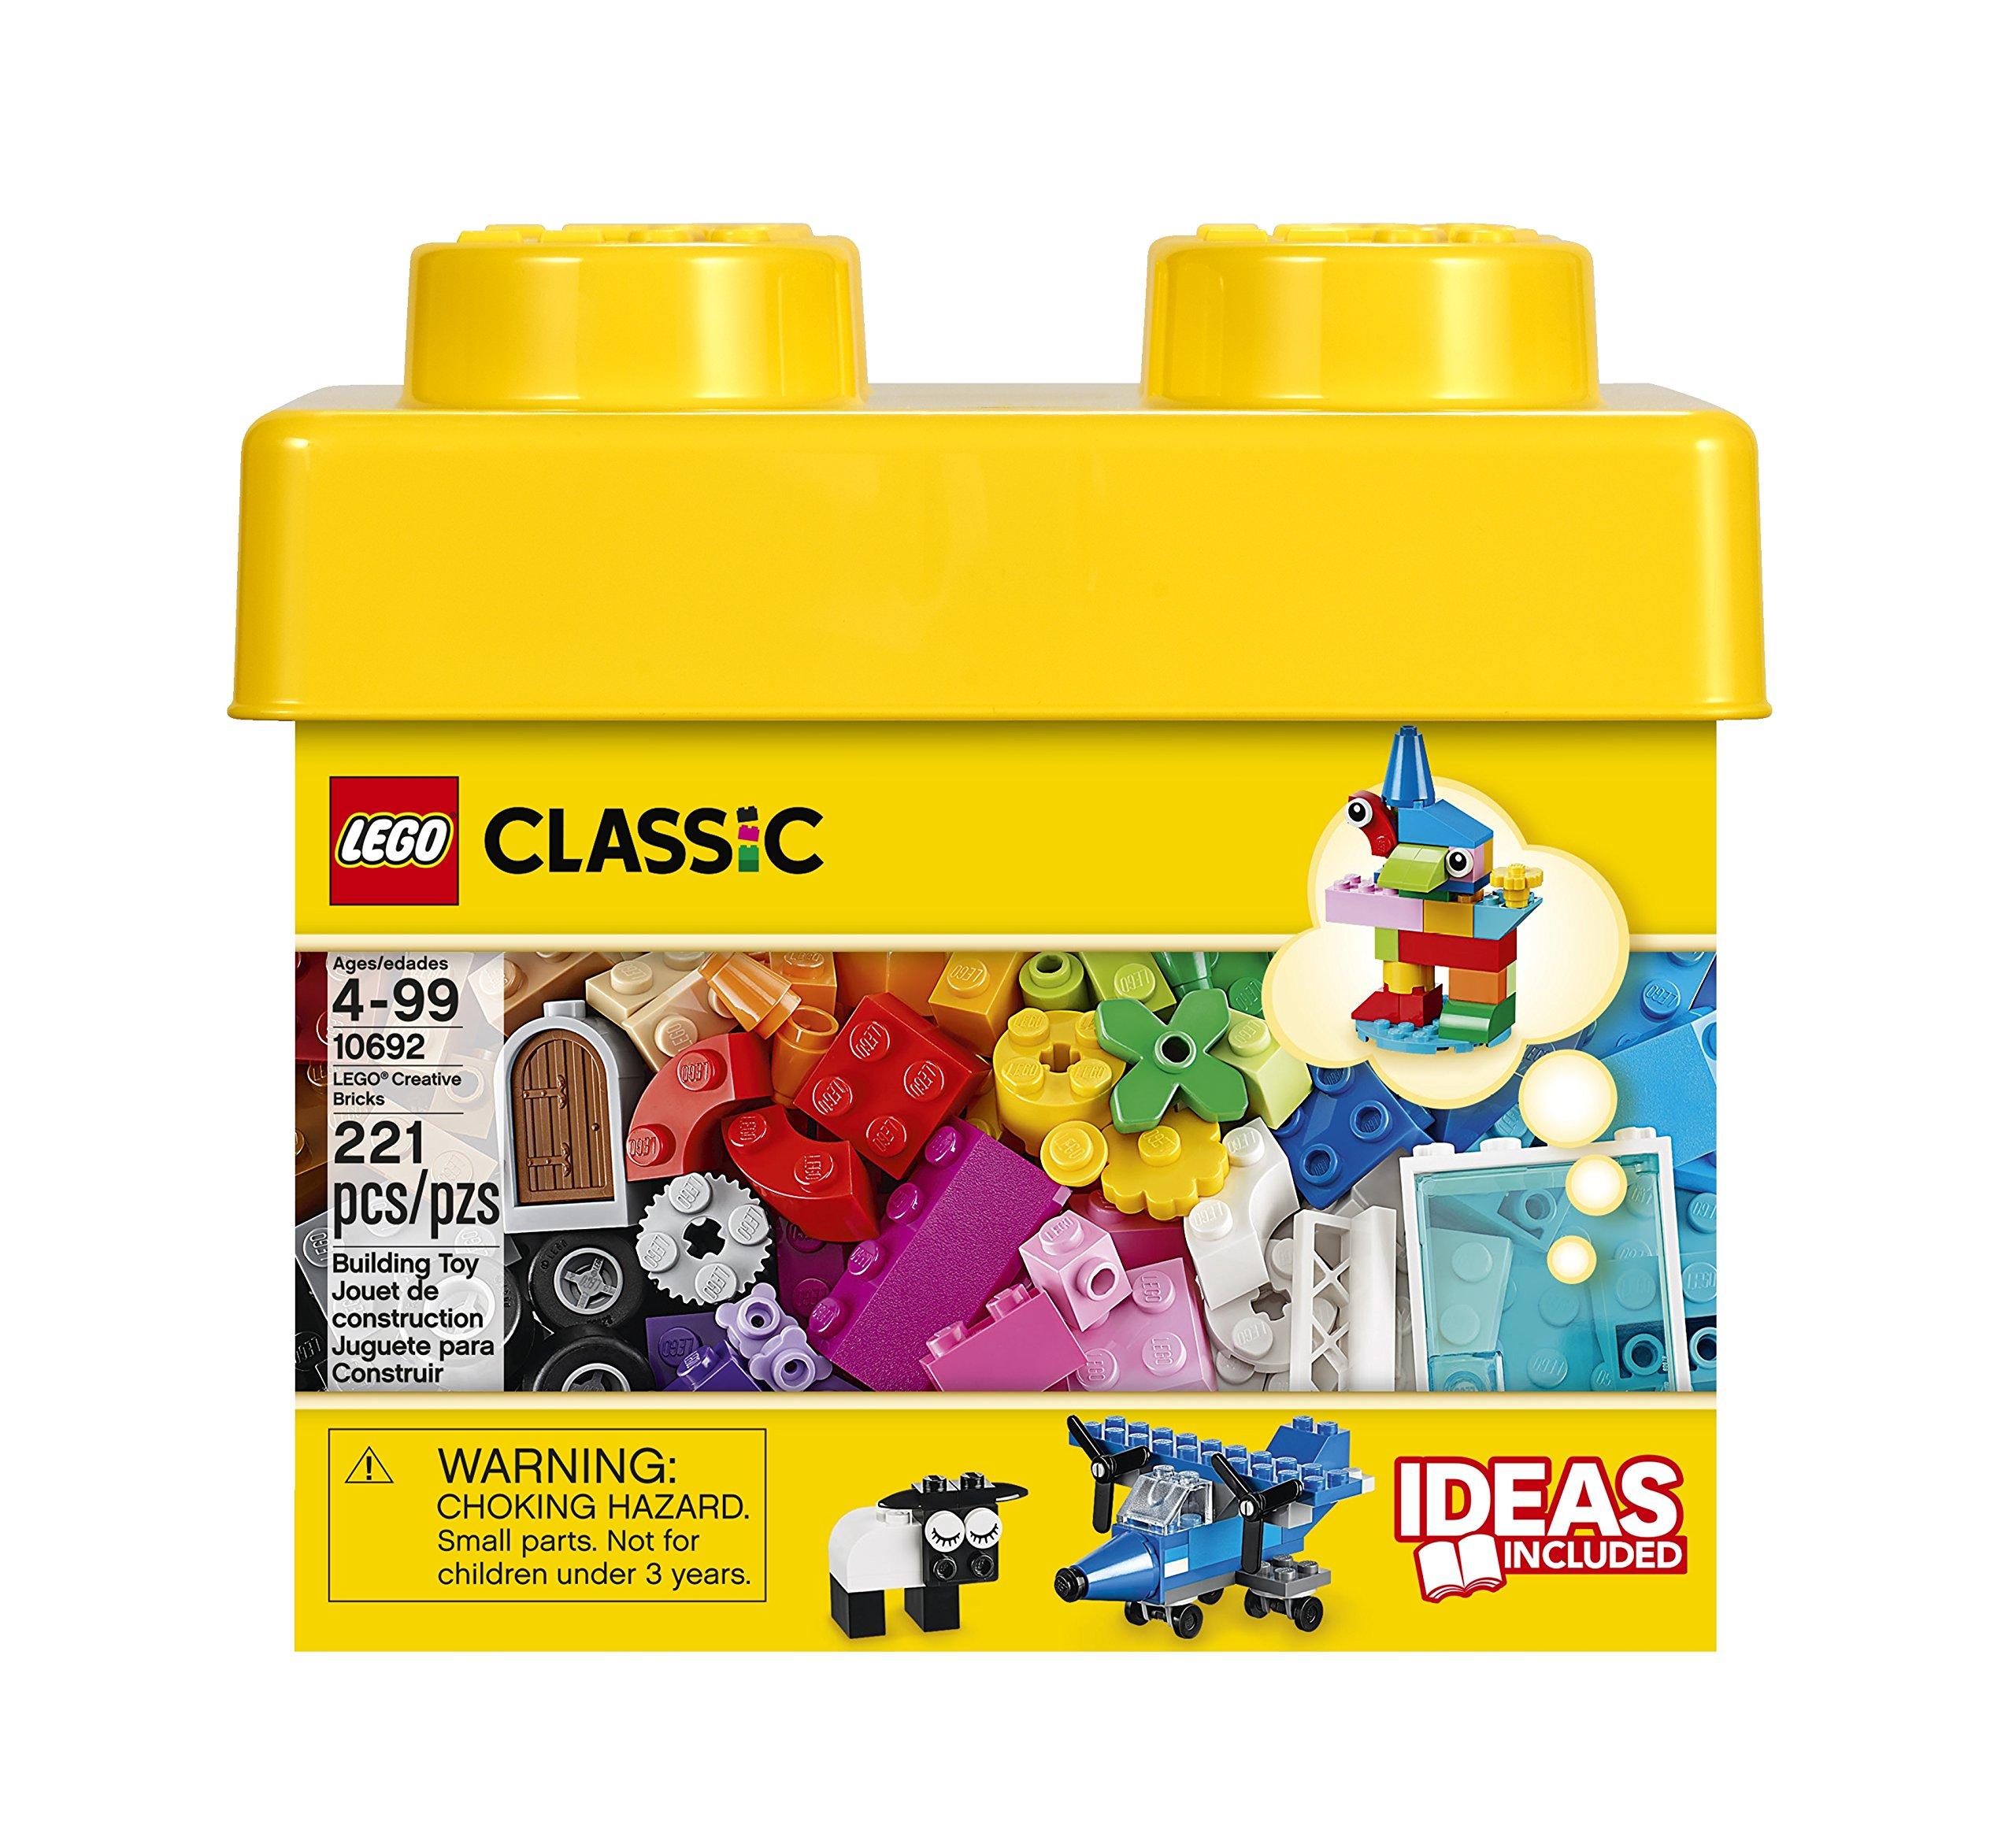 LEGO Classic Creative Bricks 10692 Building Blocks, Learning Toy by LEGO (Image #2)